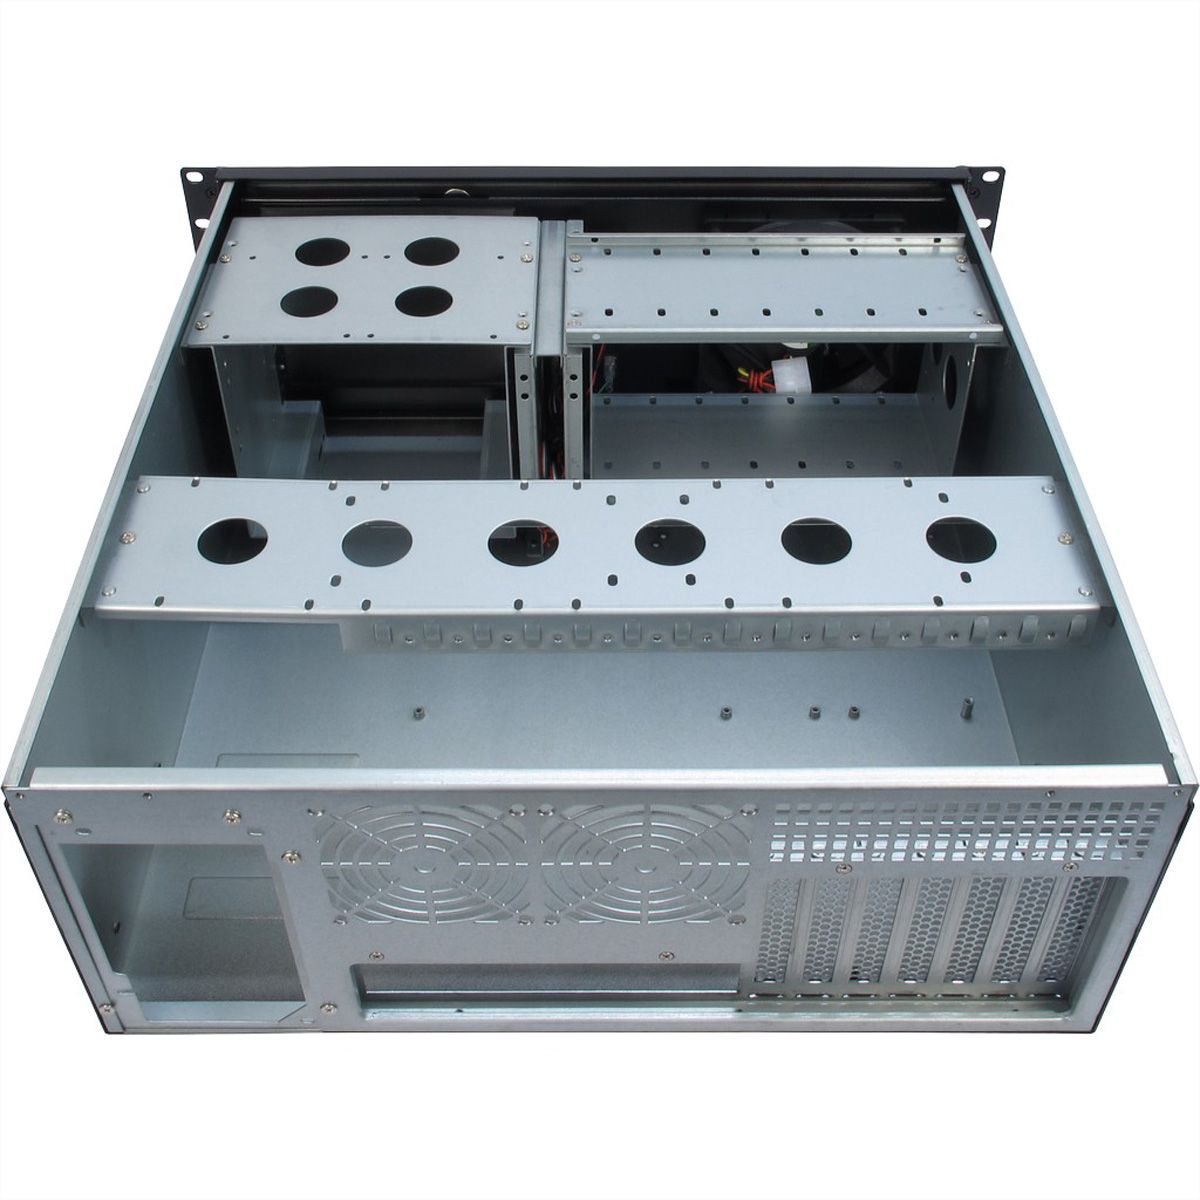 value 19 industrial rack mount server